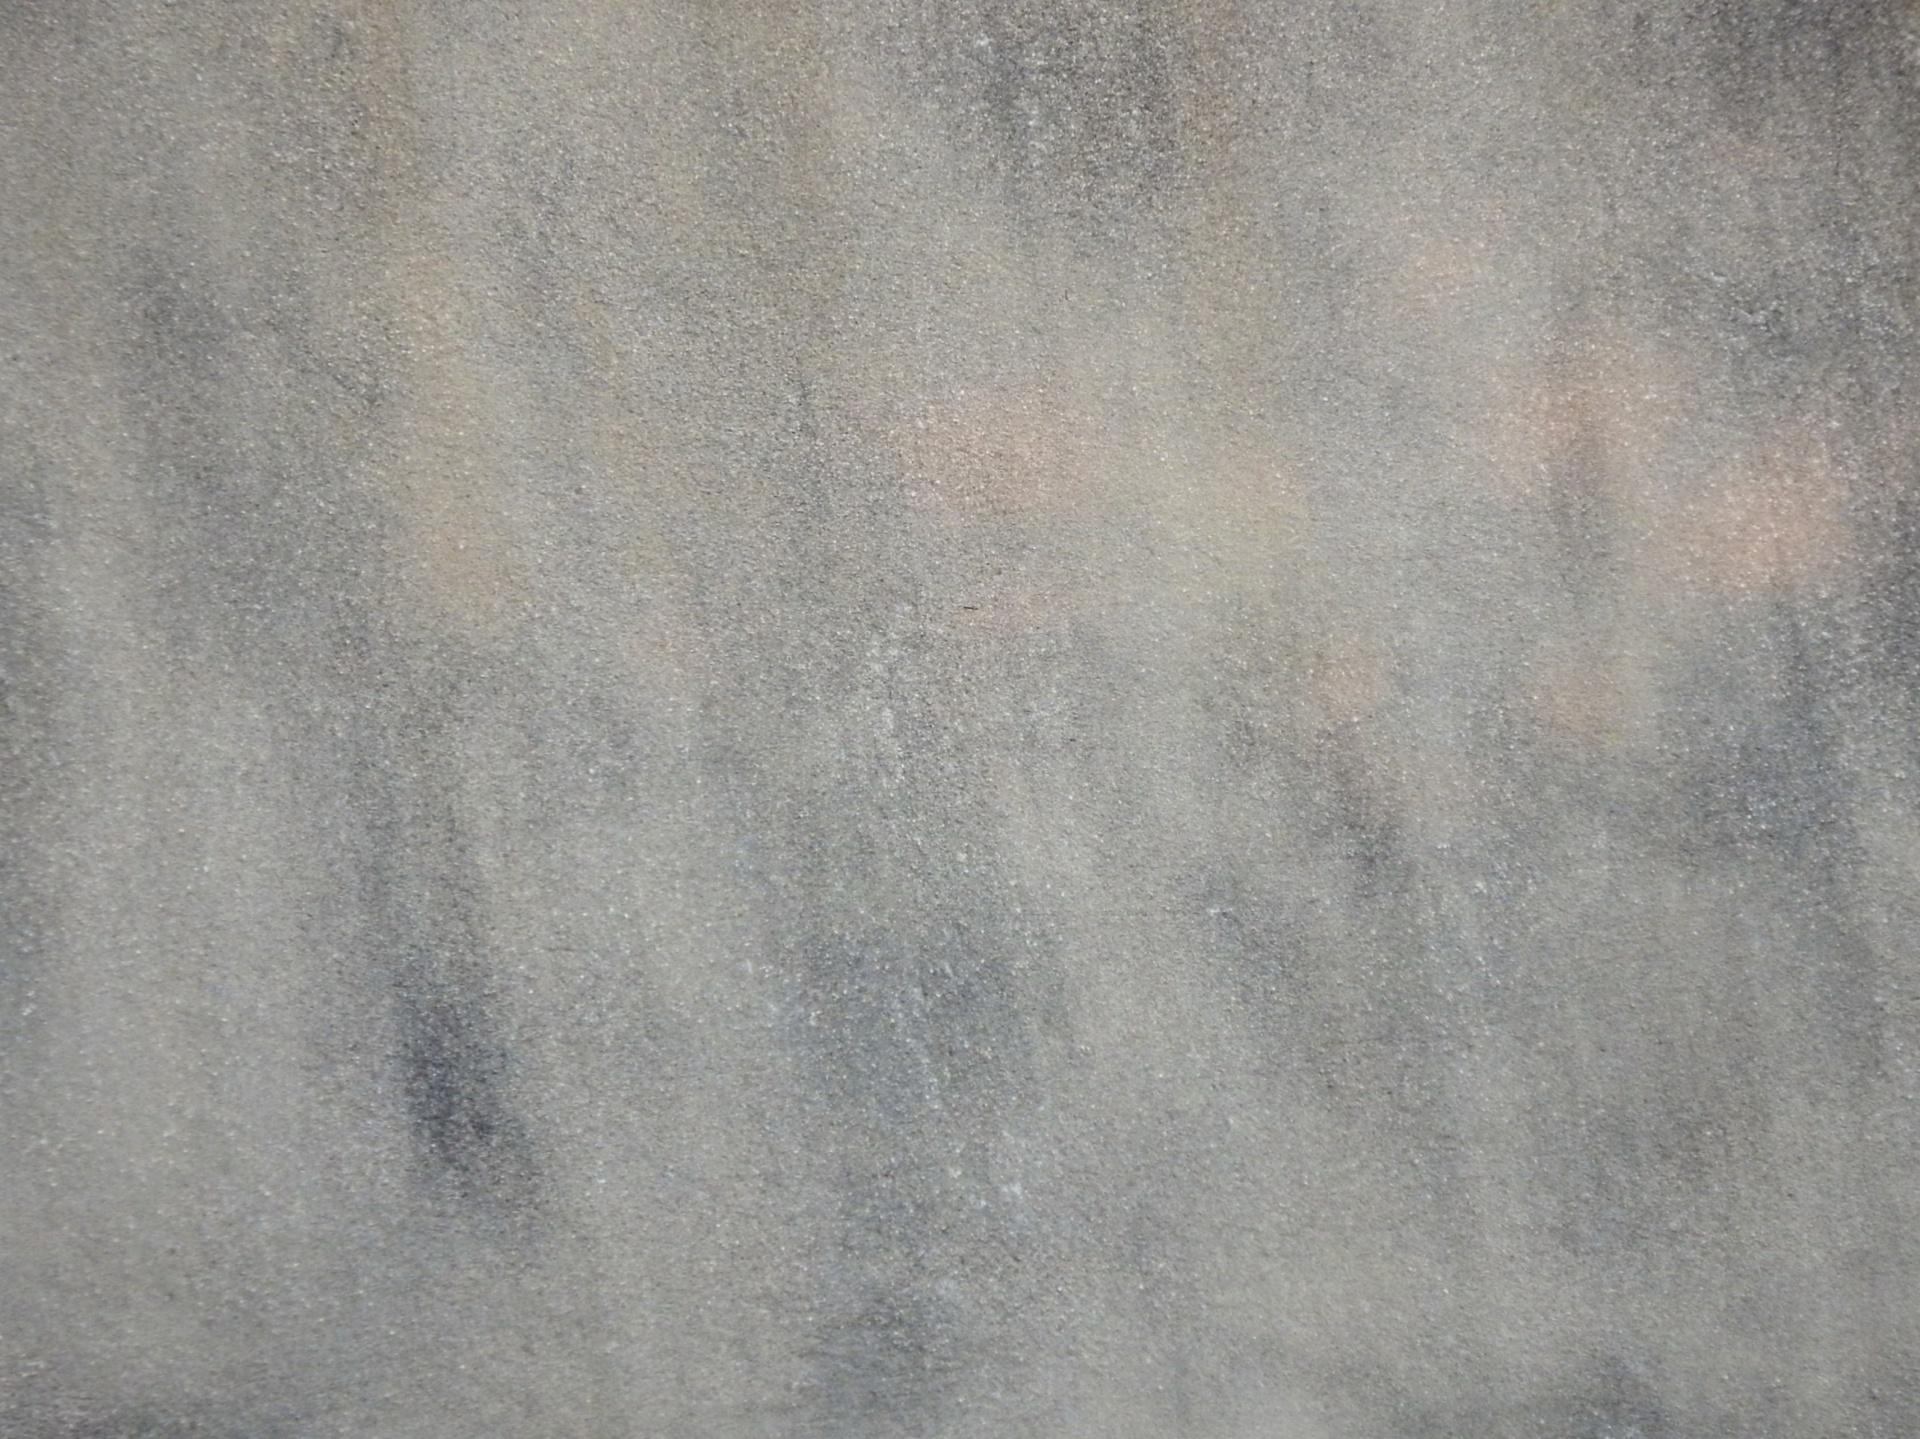 Grey Concrete Texture Free Stock Photo - Public Domain Pictures